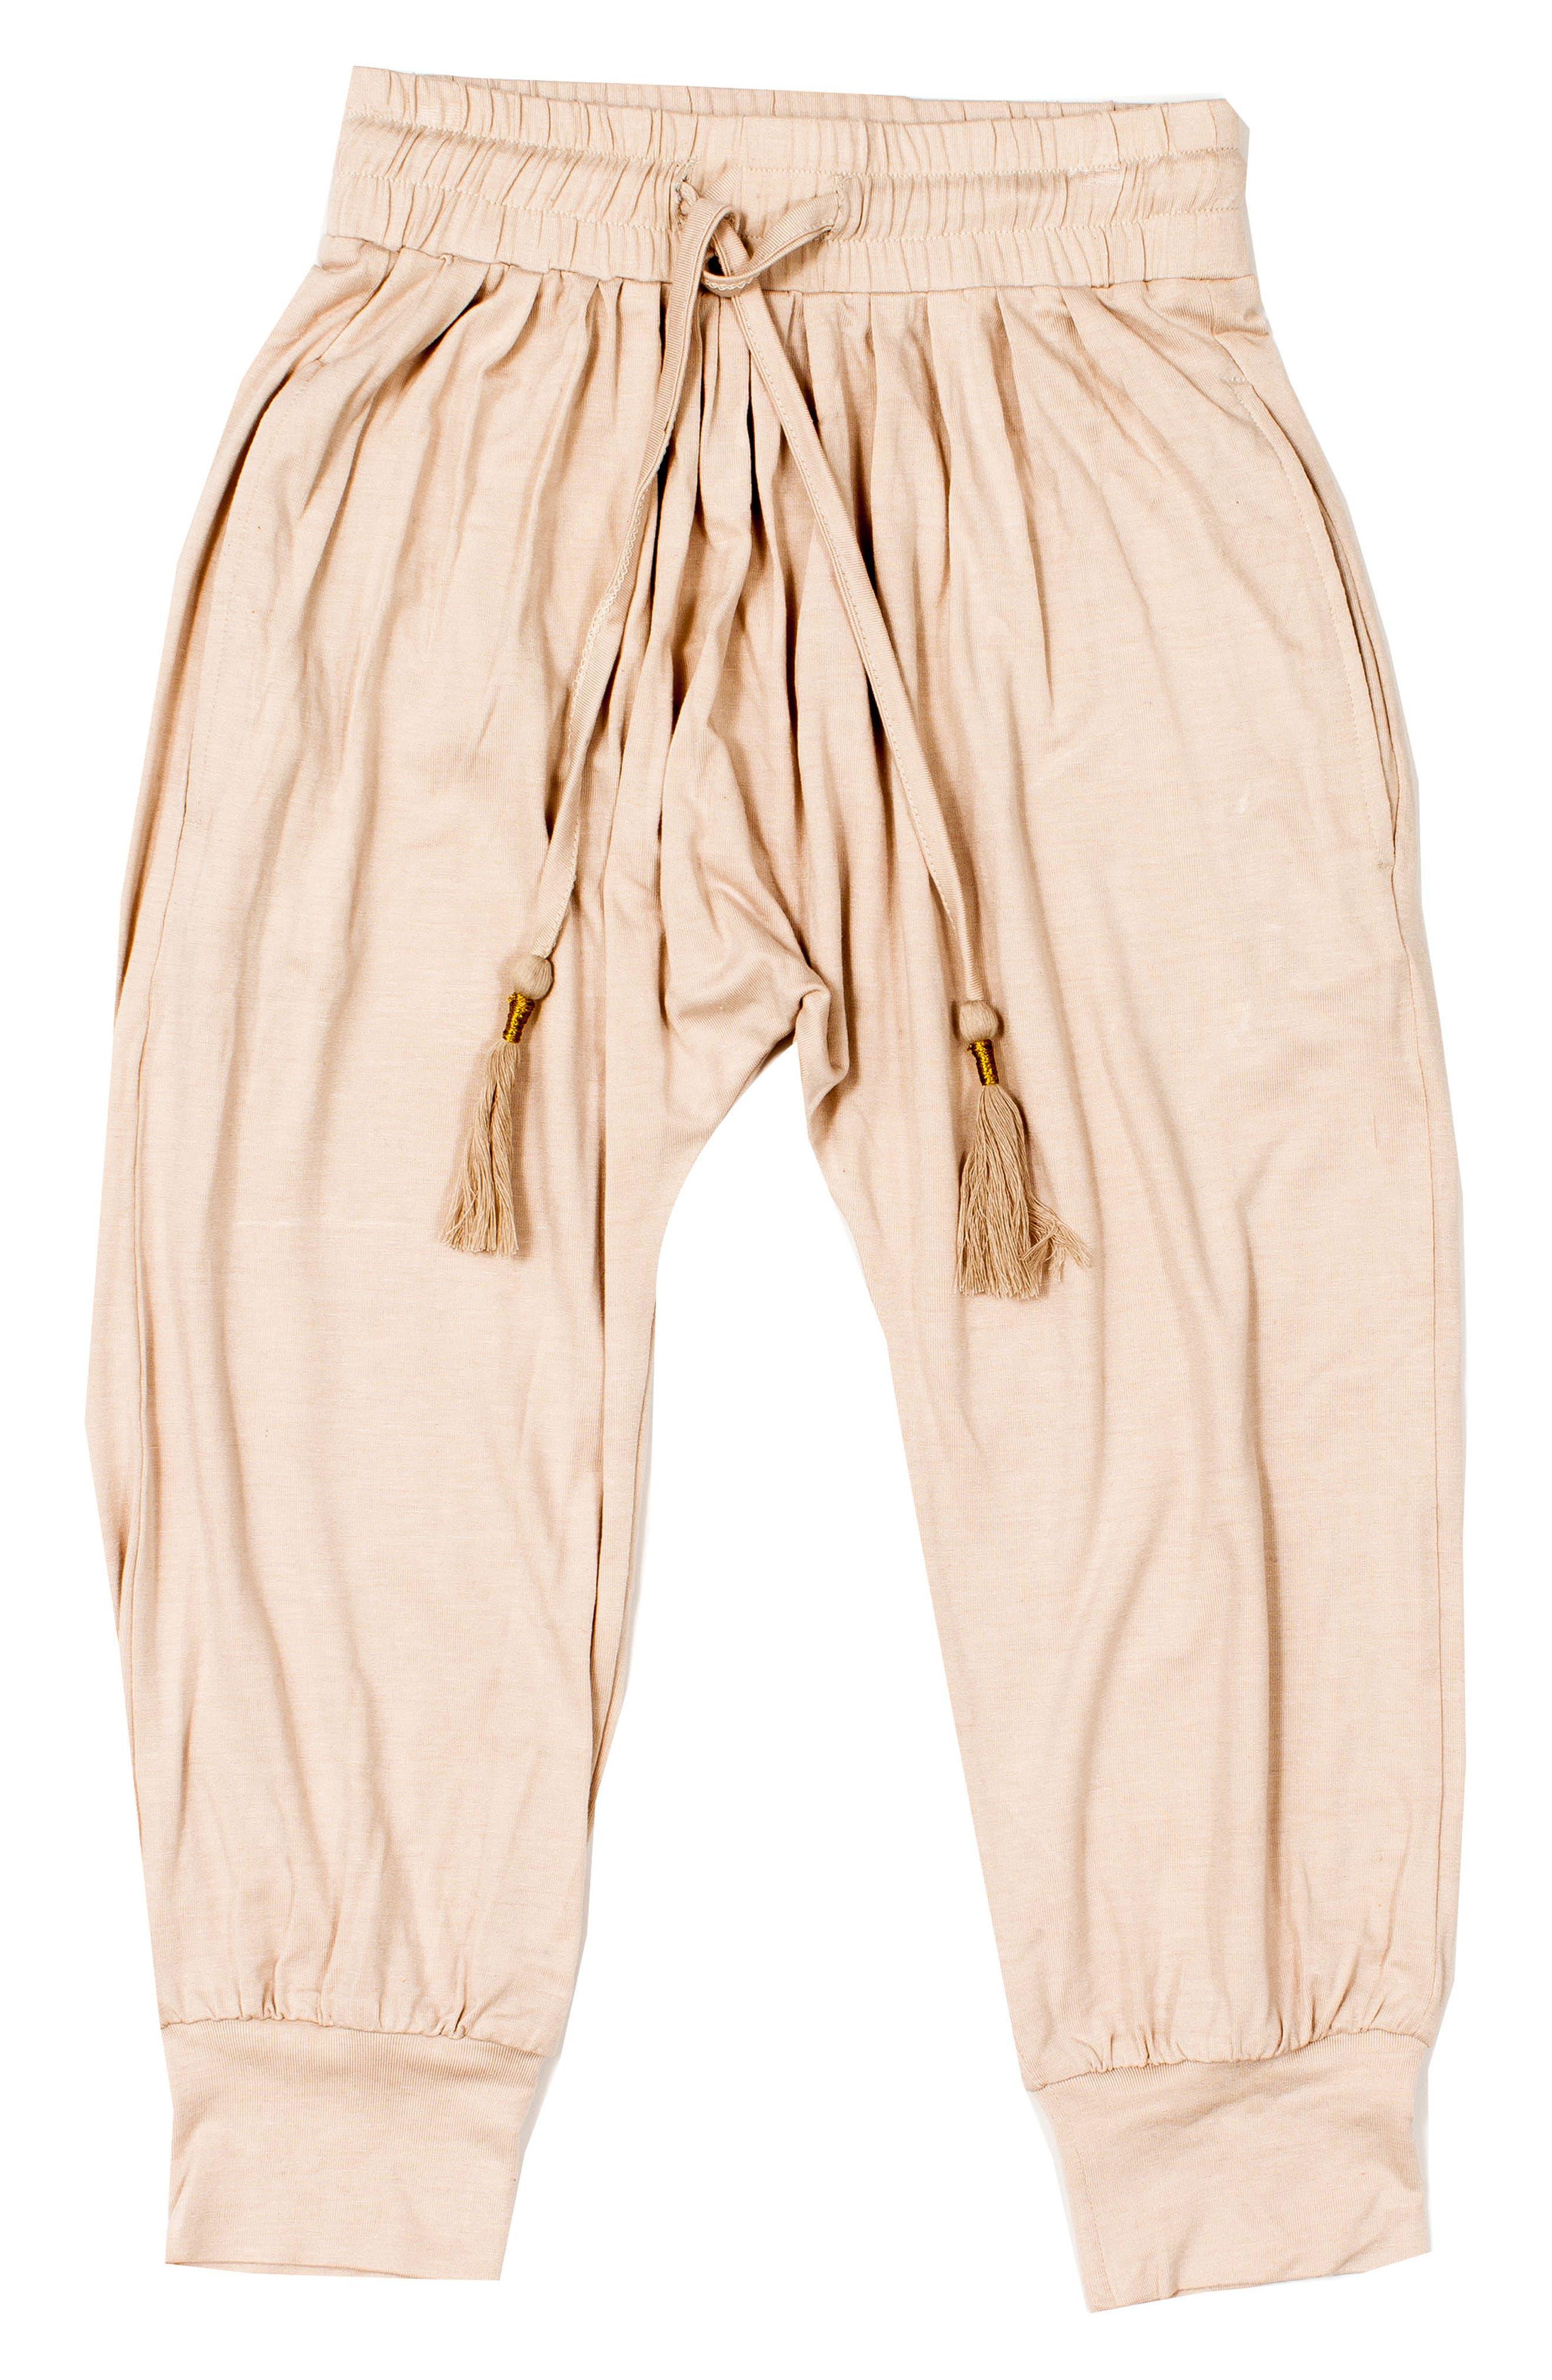 BOWIE X JAMES Gathered Pants (Toddler Girls, Little Girls & Big Girls)